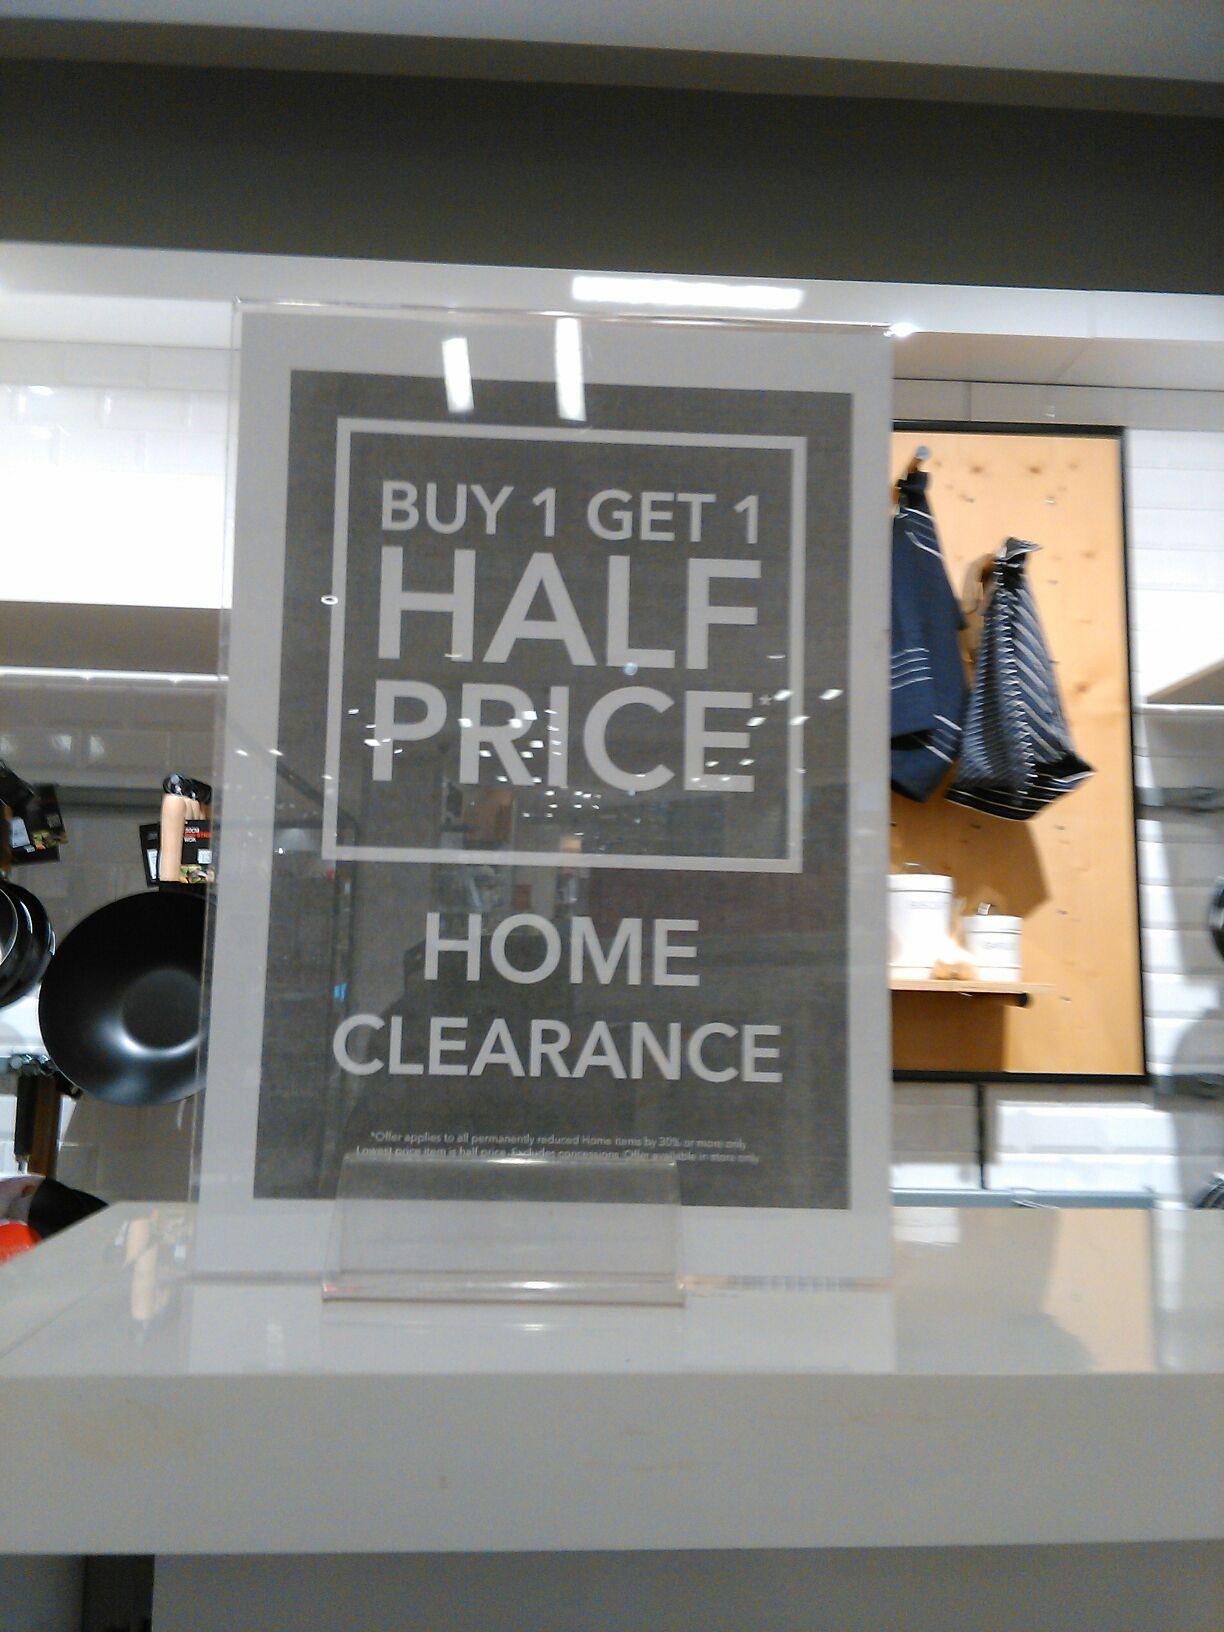 Debenhams clearance (Buy 1 get 1 half price) - Birmingham bull ring